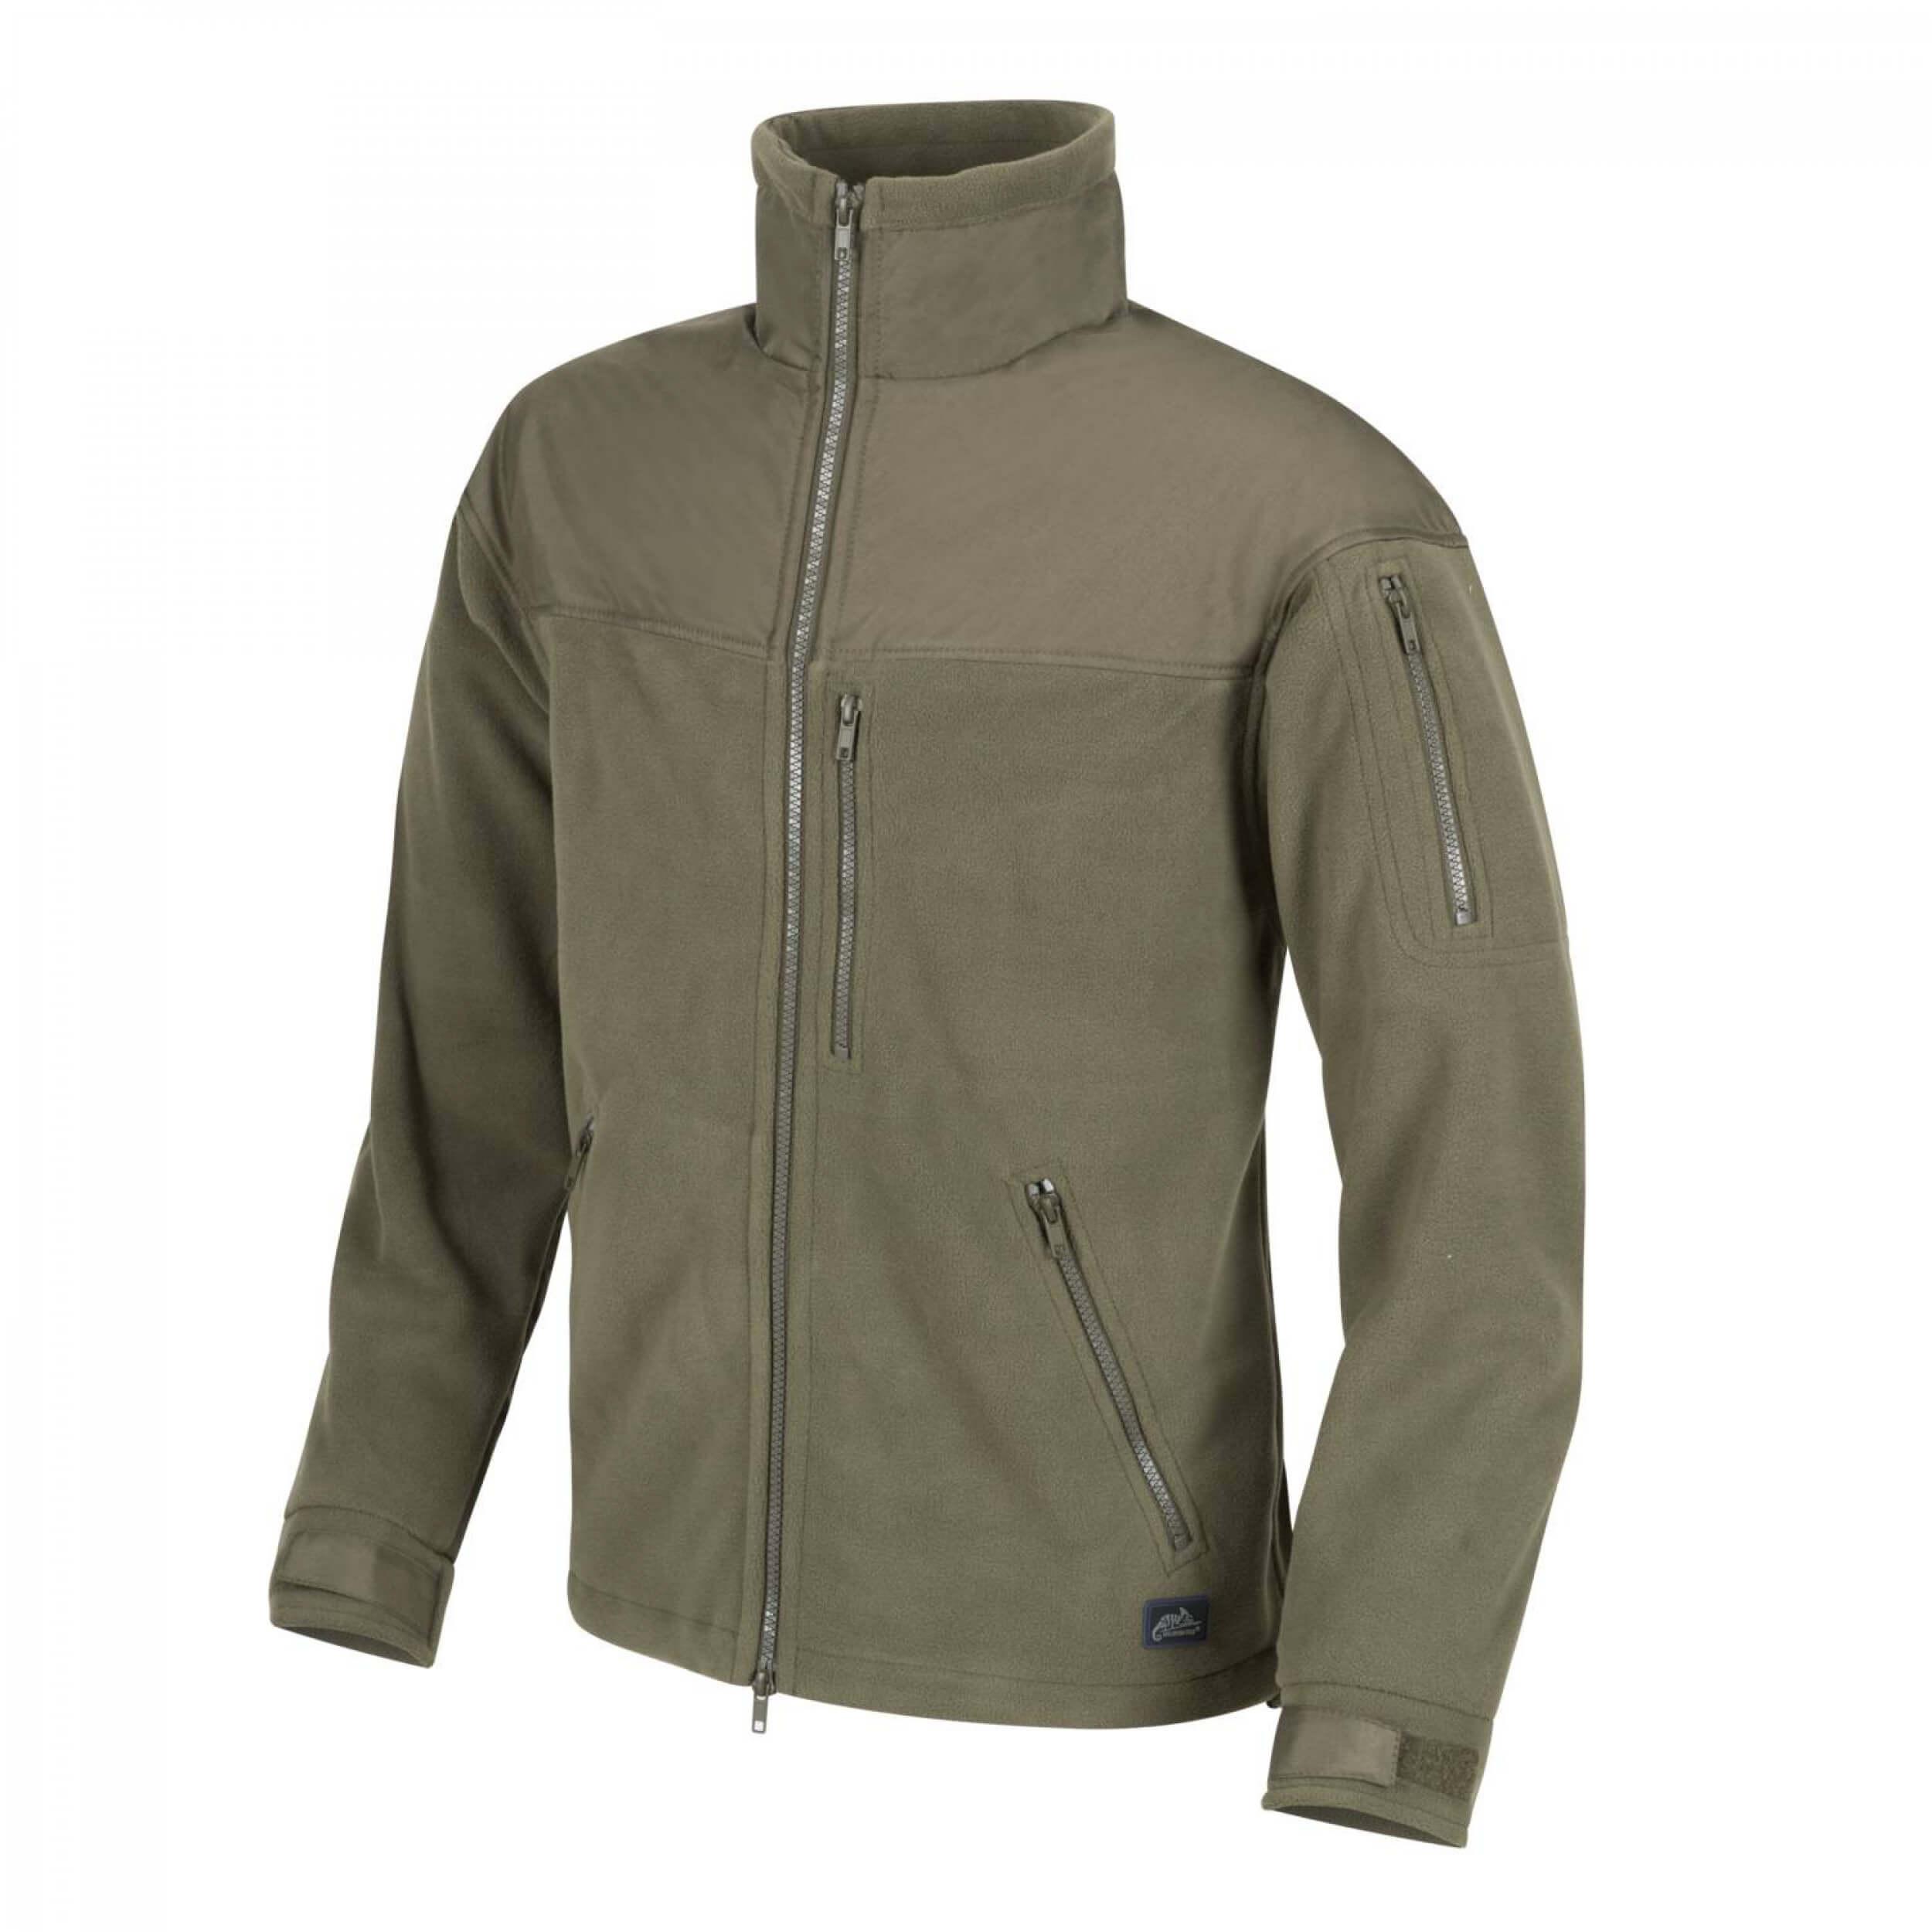 Helikon-Tex Classic Army -Fleece- Jacke Olive Green